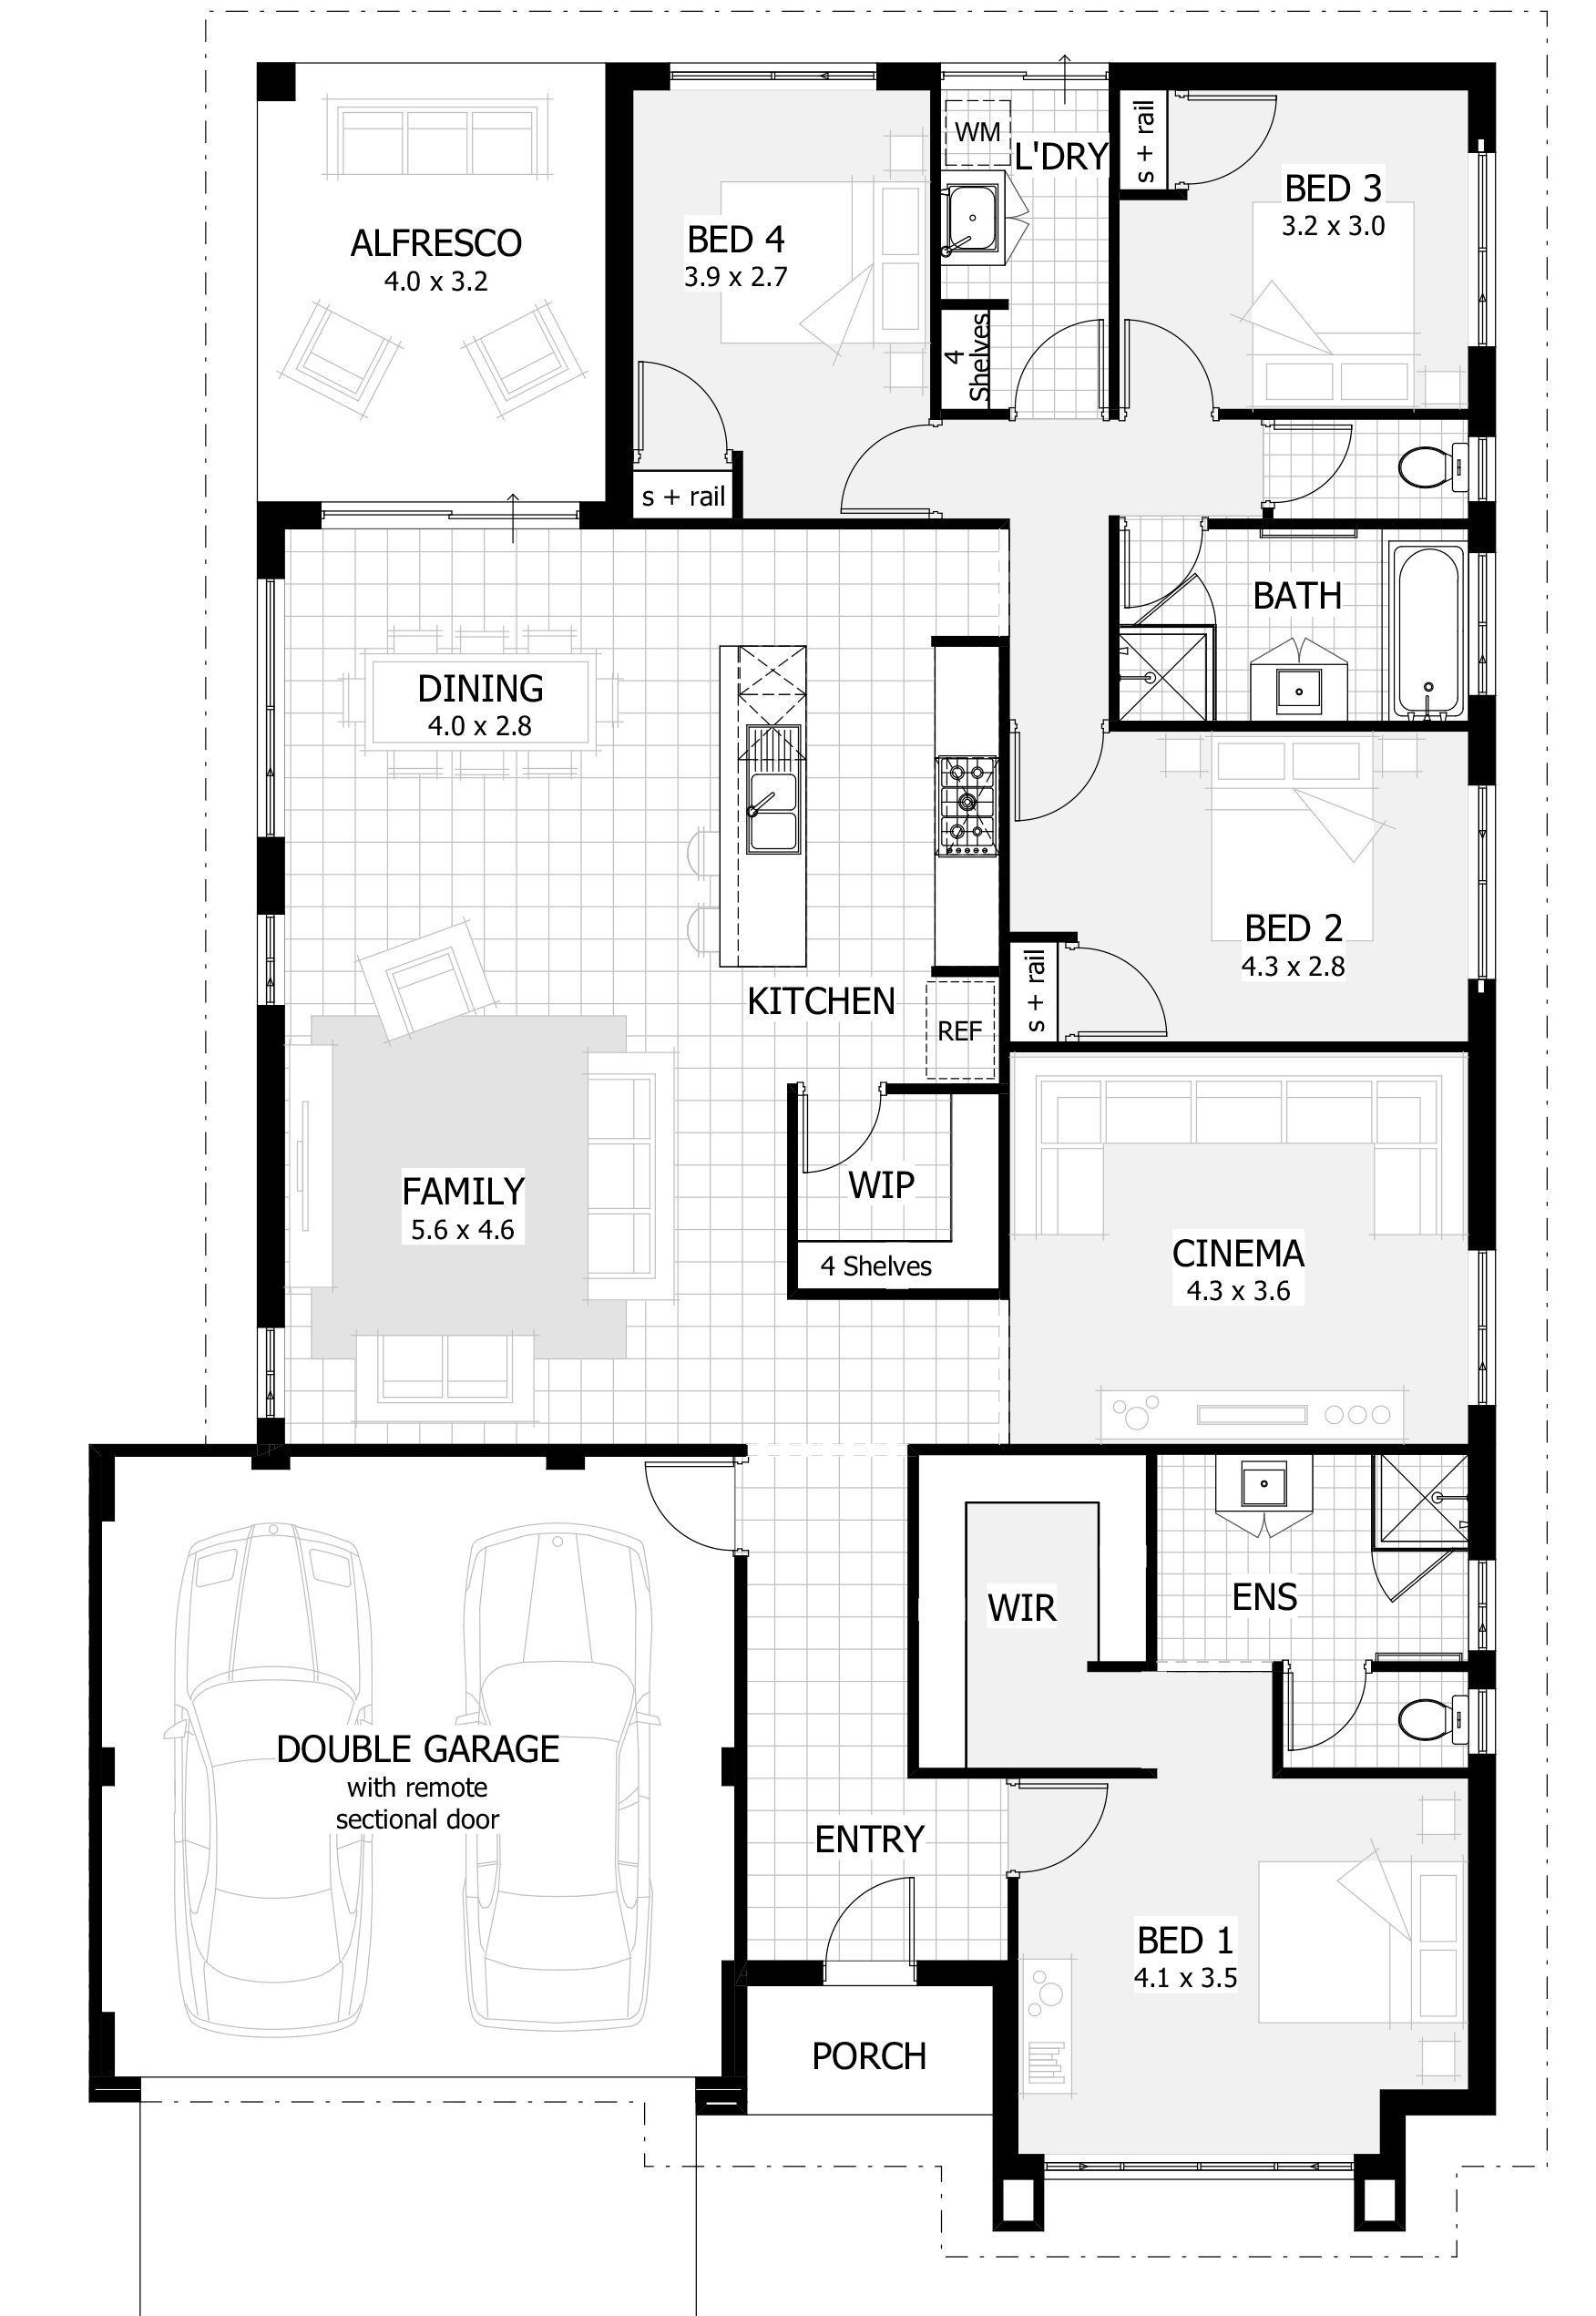 New Home Designs Perth Wa Single Storey Floor Plans More In 2020 Single Storey House Plans House Plans Australia Australian House Plans